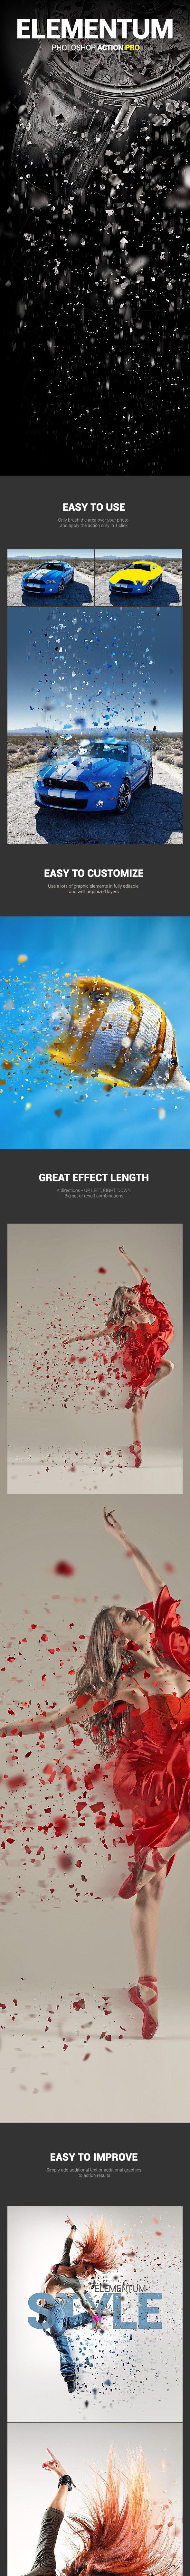 Splinters Dispersion - Elementum - Photoshop Action - Photo Effects Actions